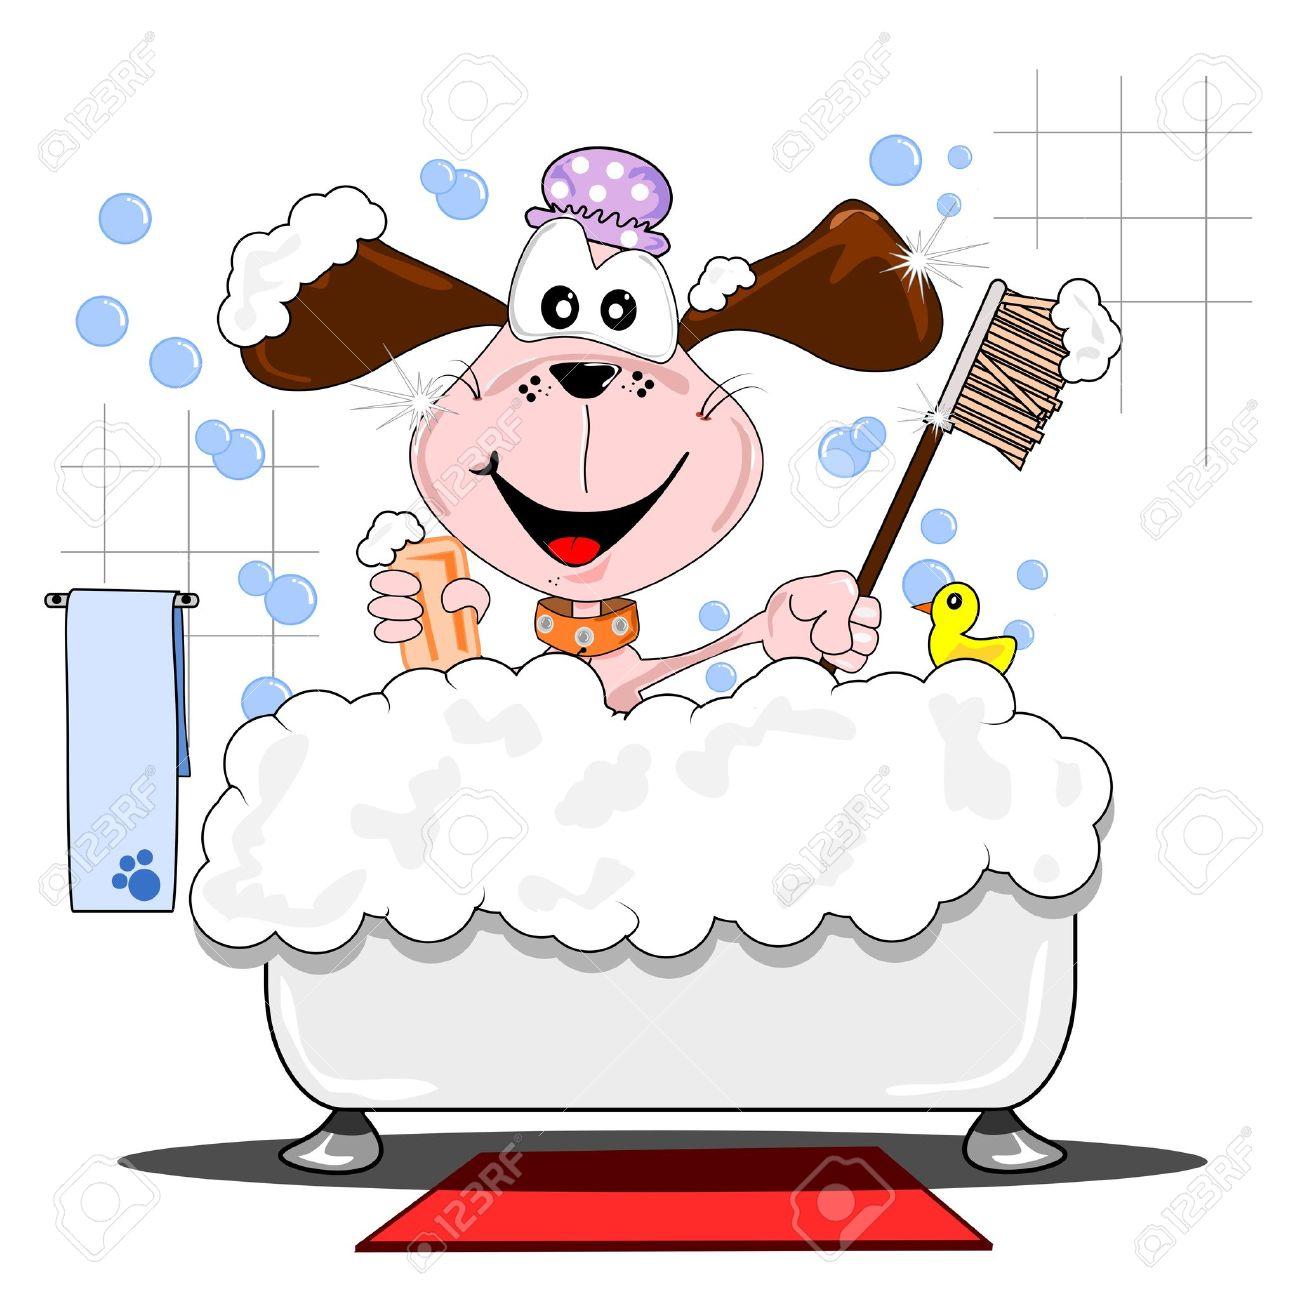 Büro frau clipart kostenlos  14,873 Bathtub Stock Vector Illustration And Royalty Free Bathtub ...